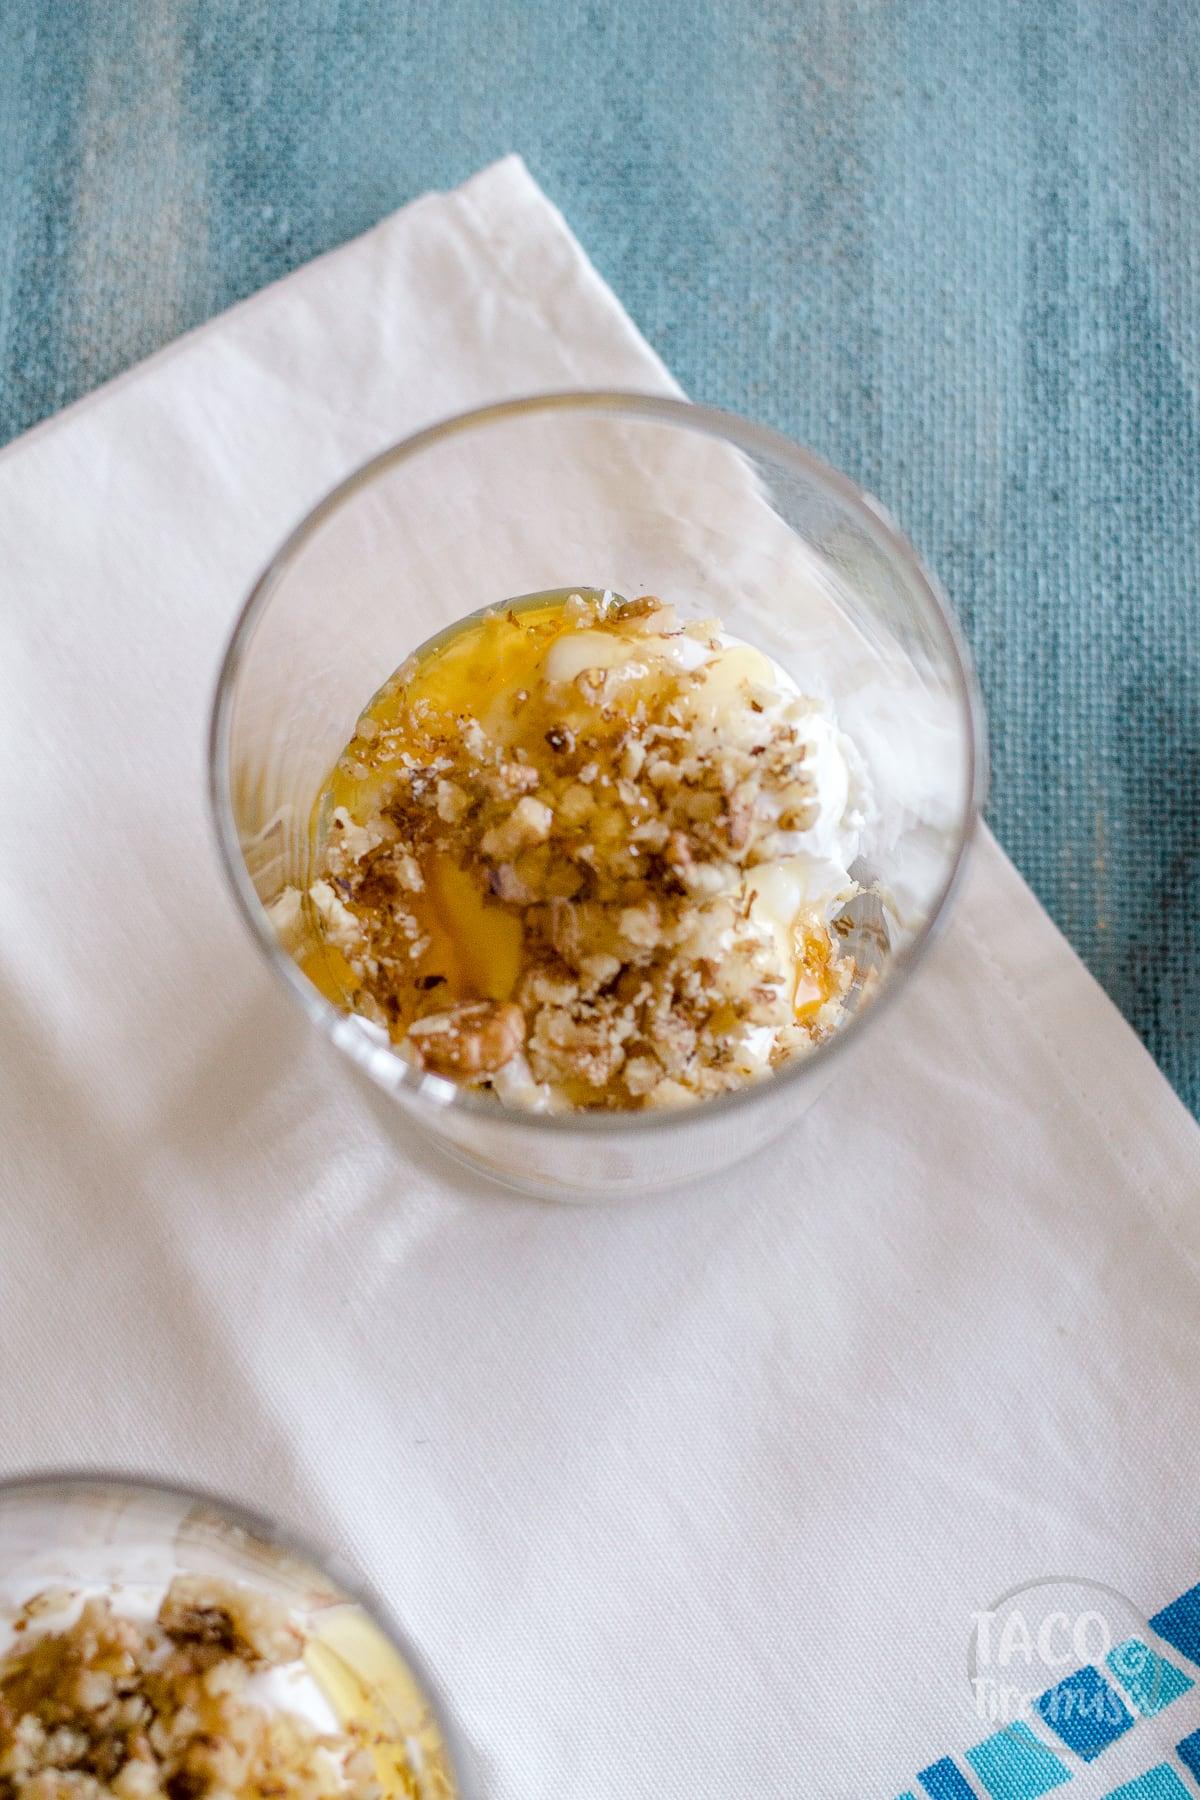 a glass half full of yogurt, honey and walnuts, flat lay